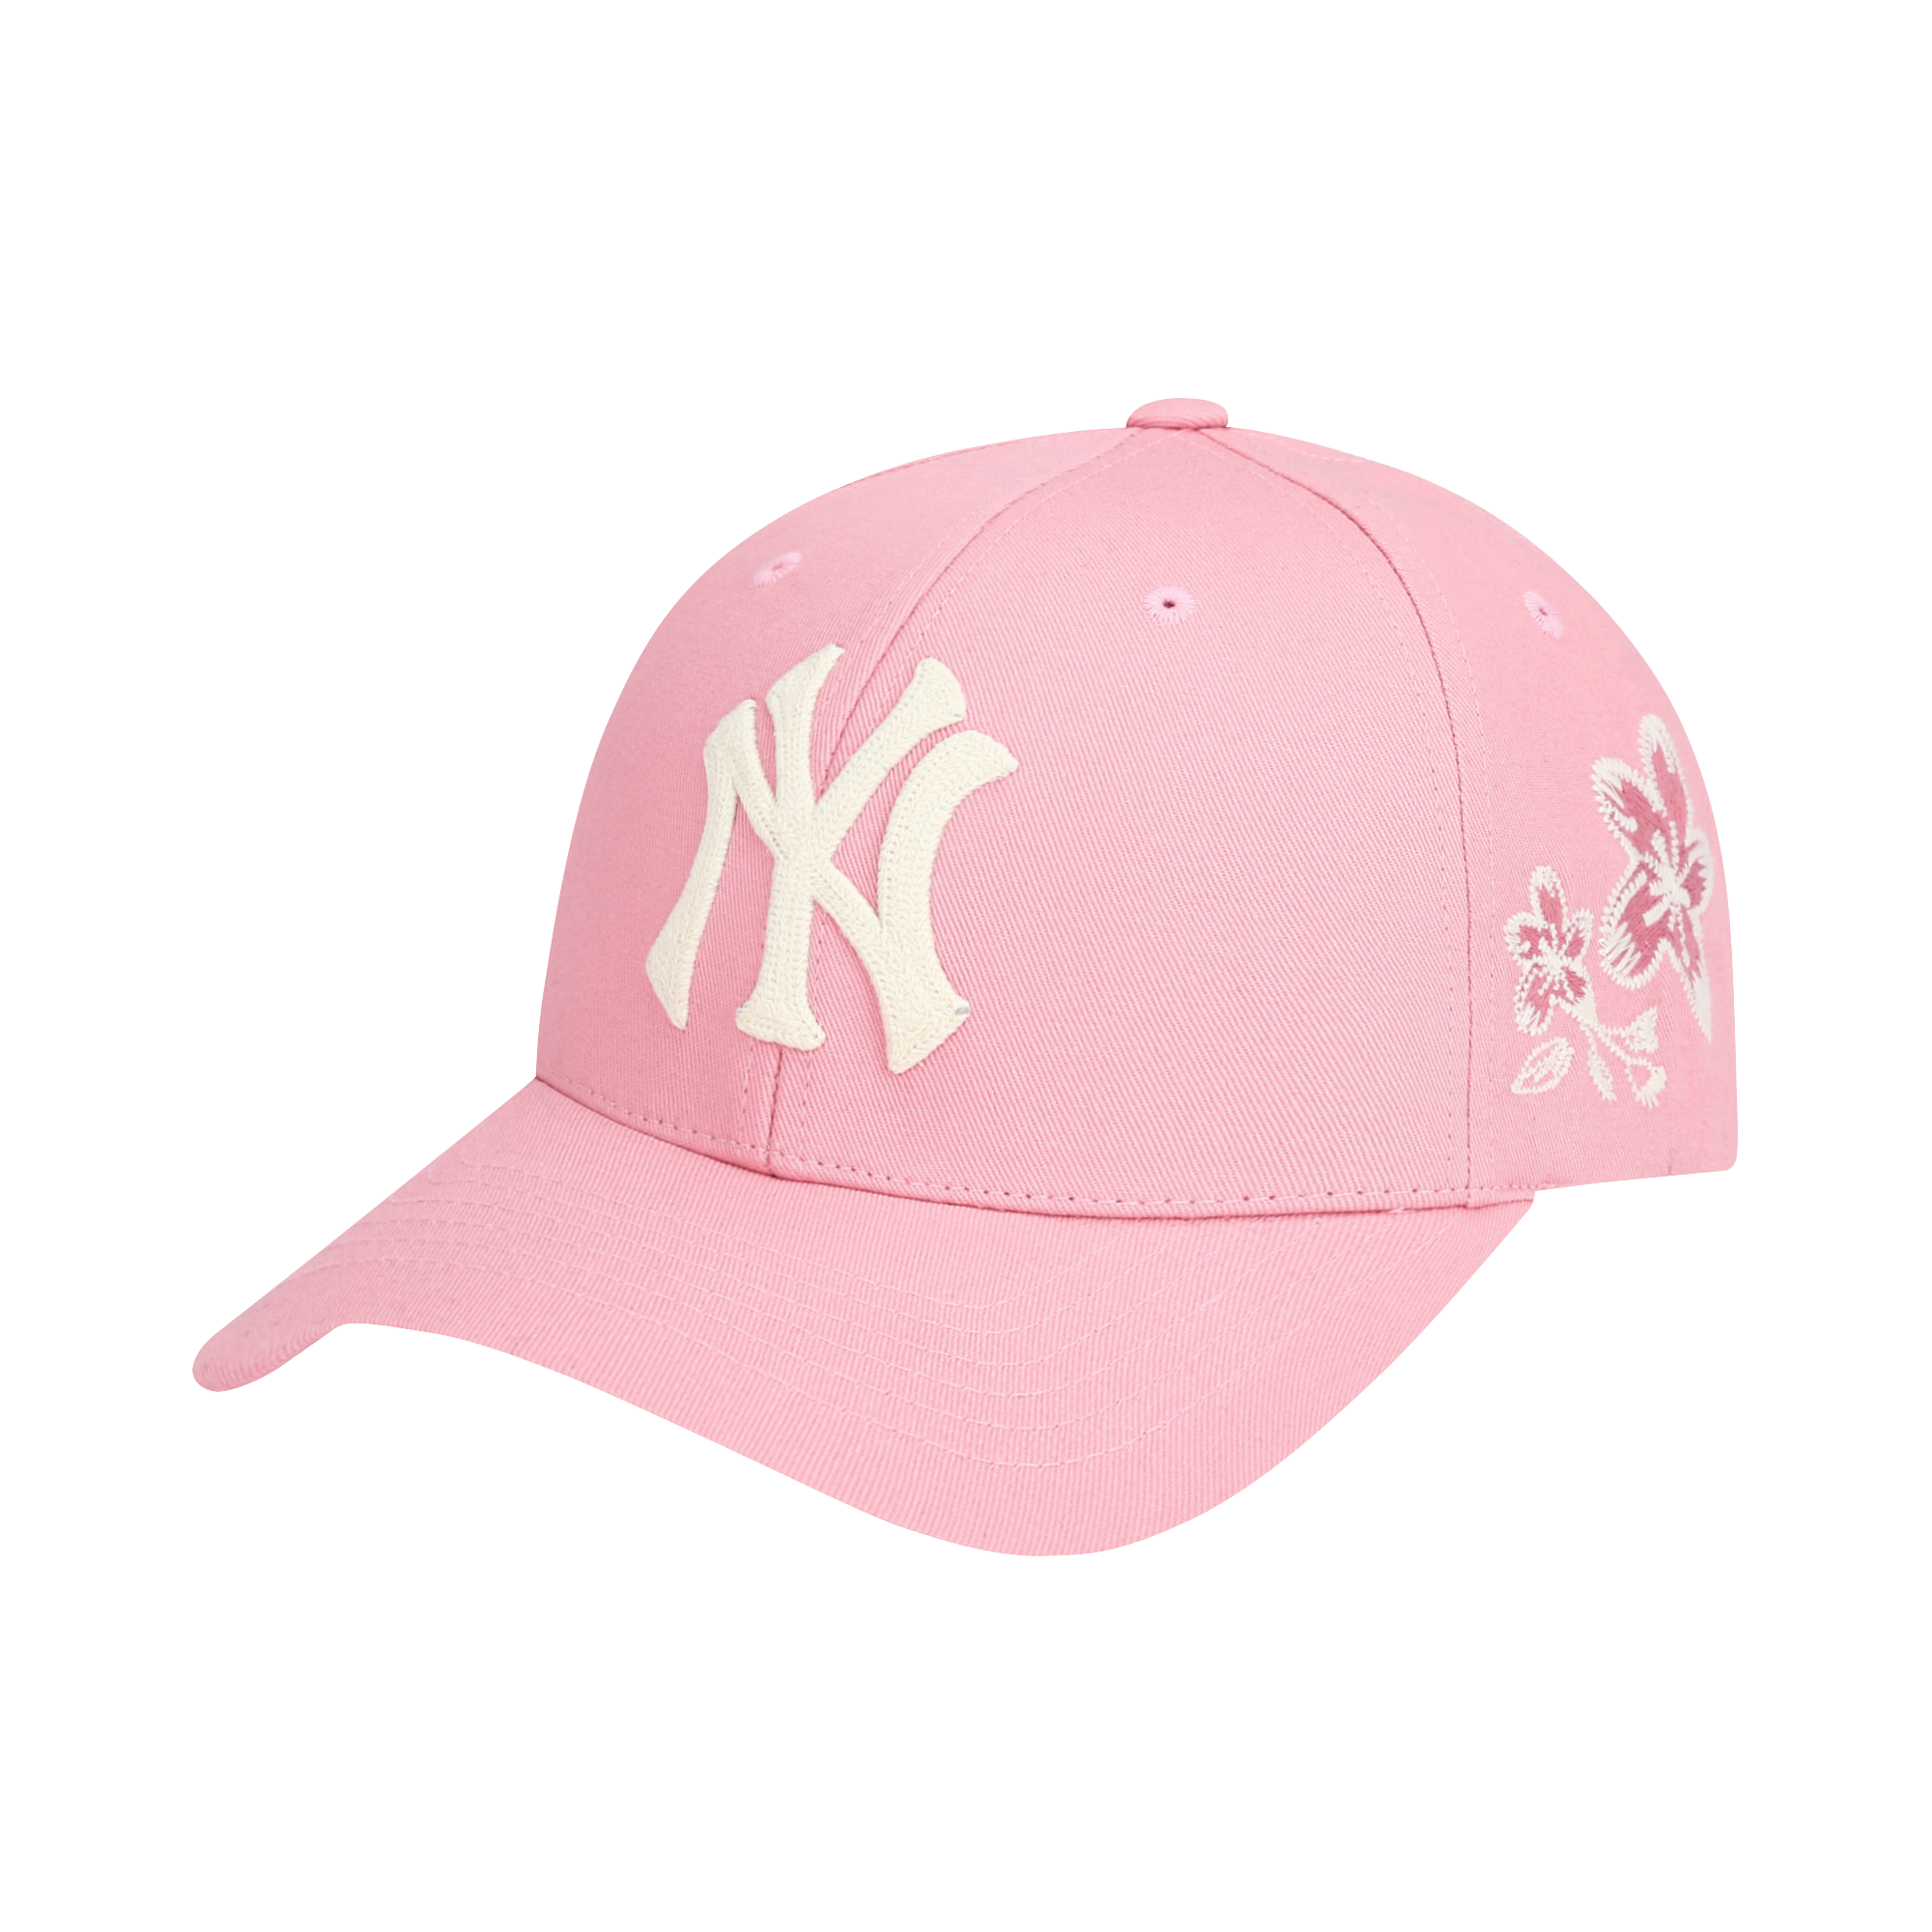 NEW YORK YANKEES JOUY ADJUSTABLE CAP